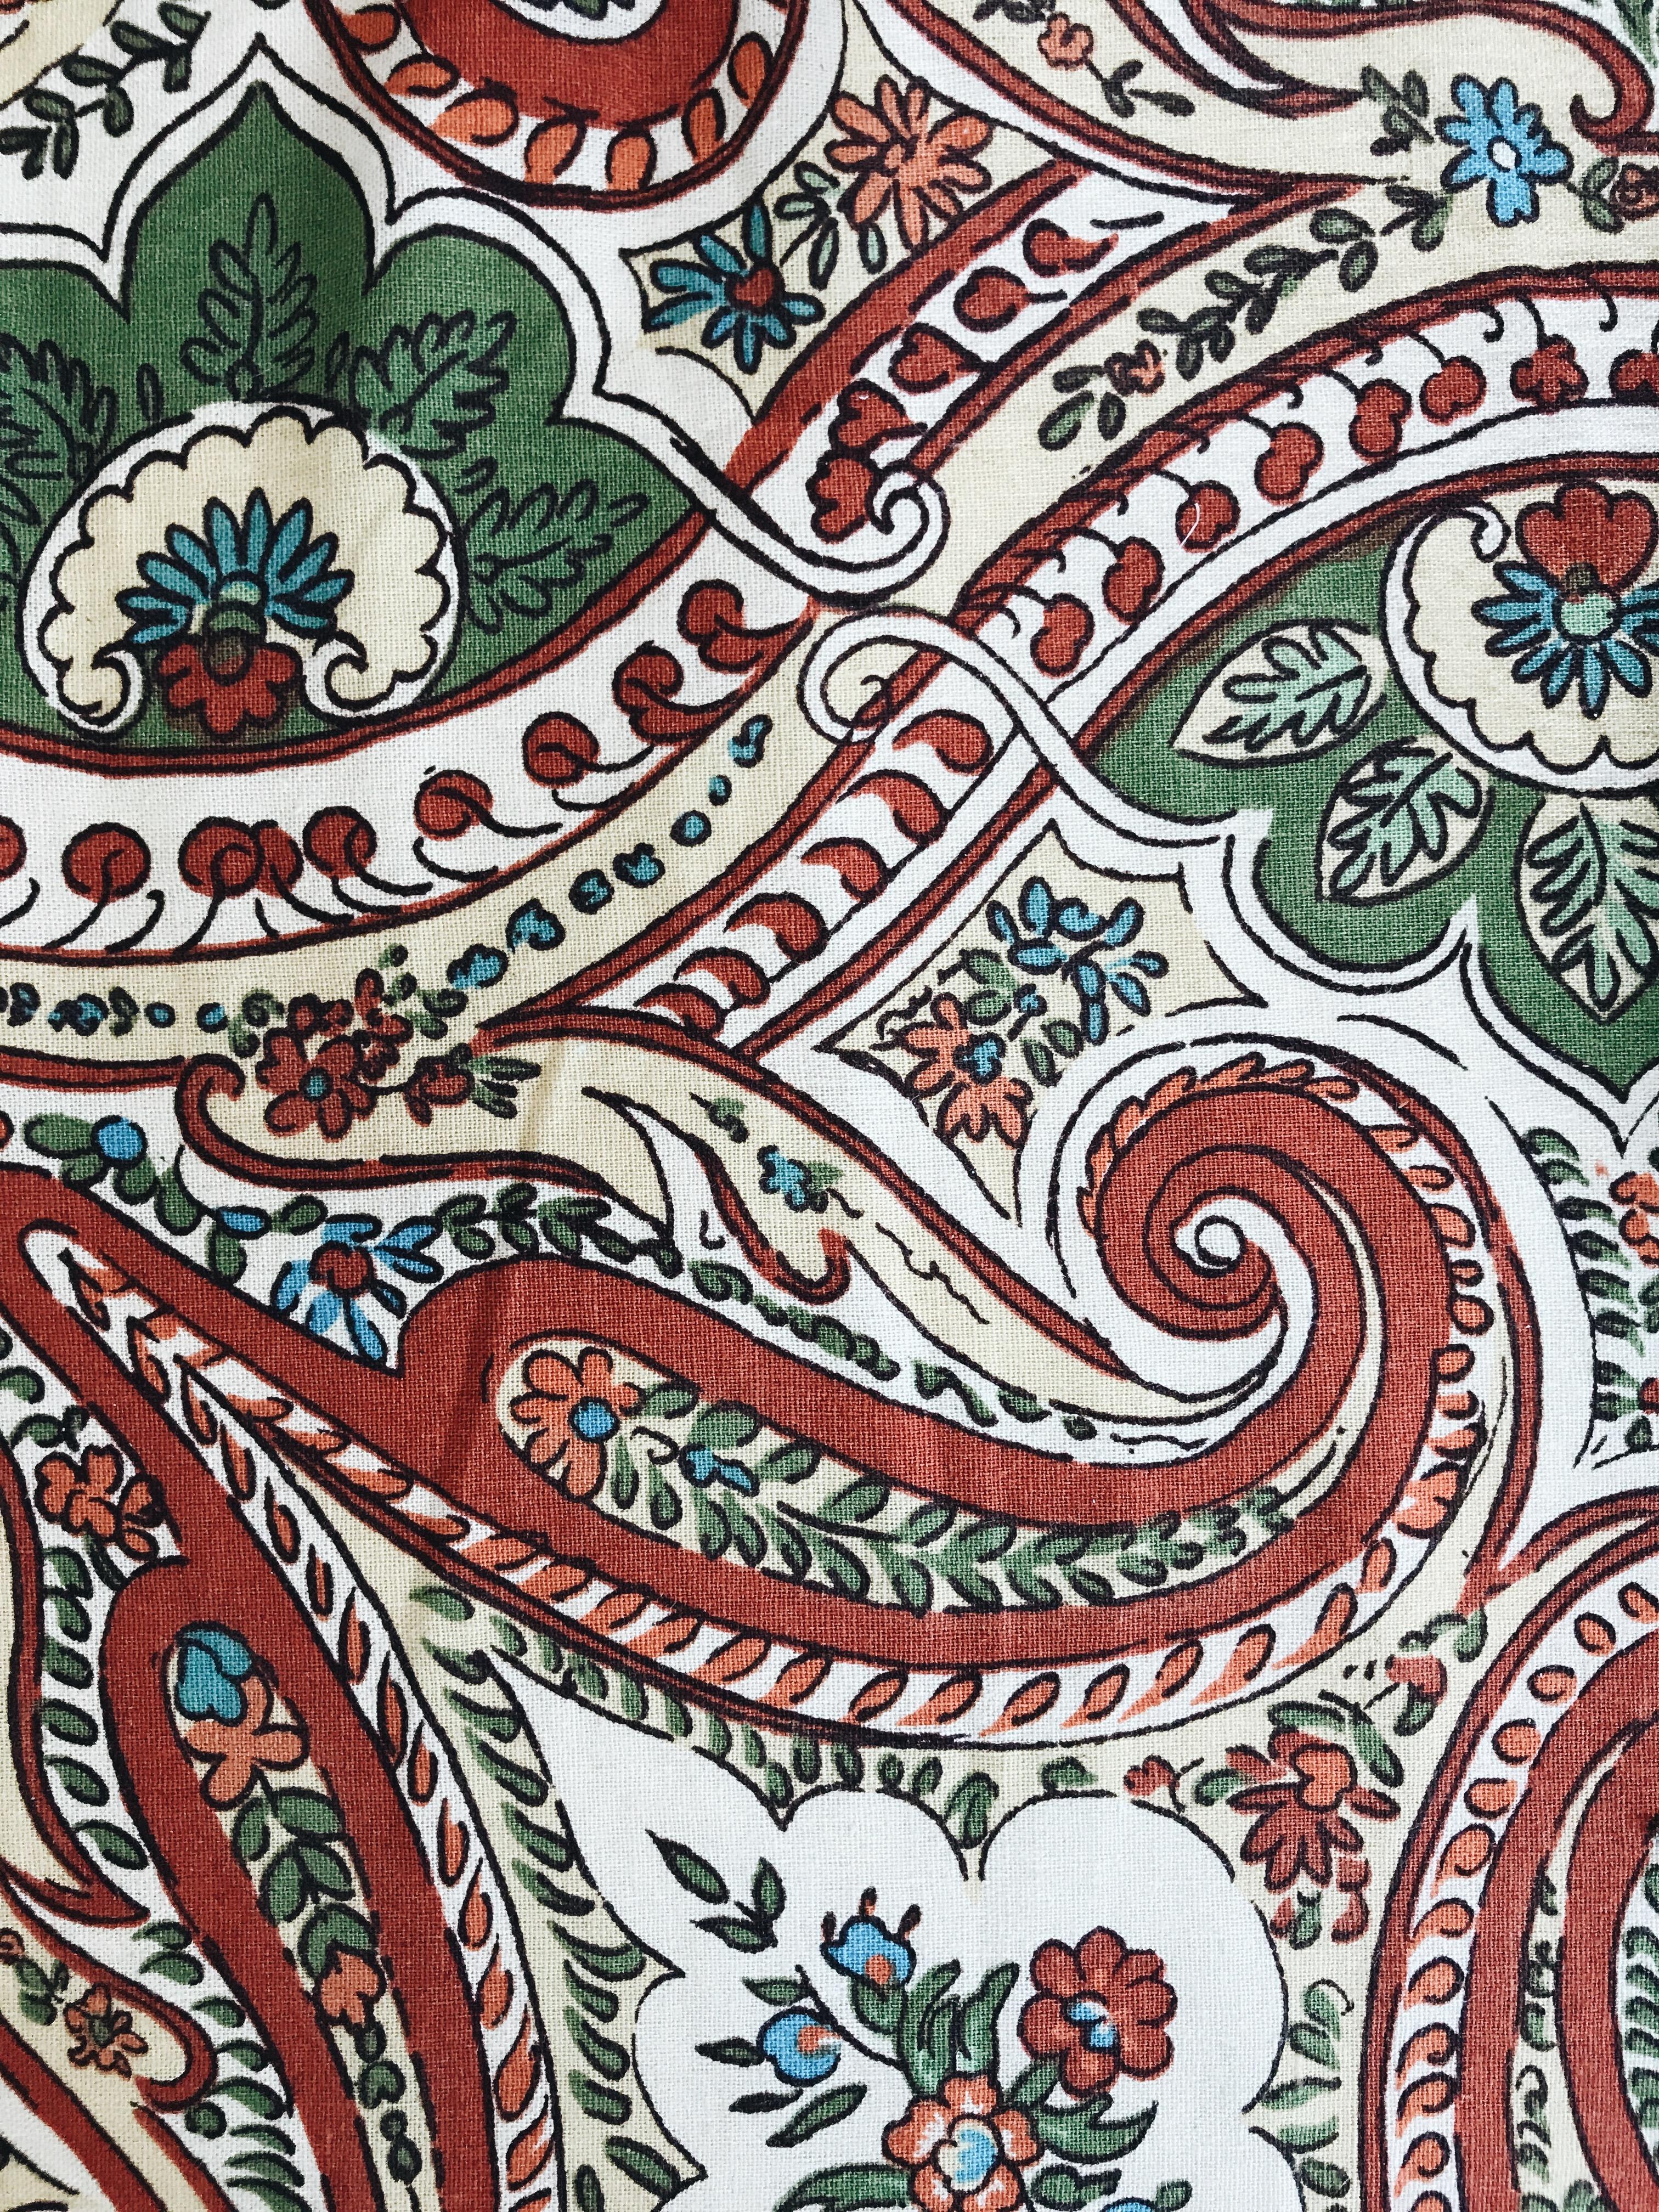 farmer's market tapestry